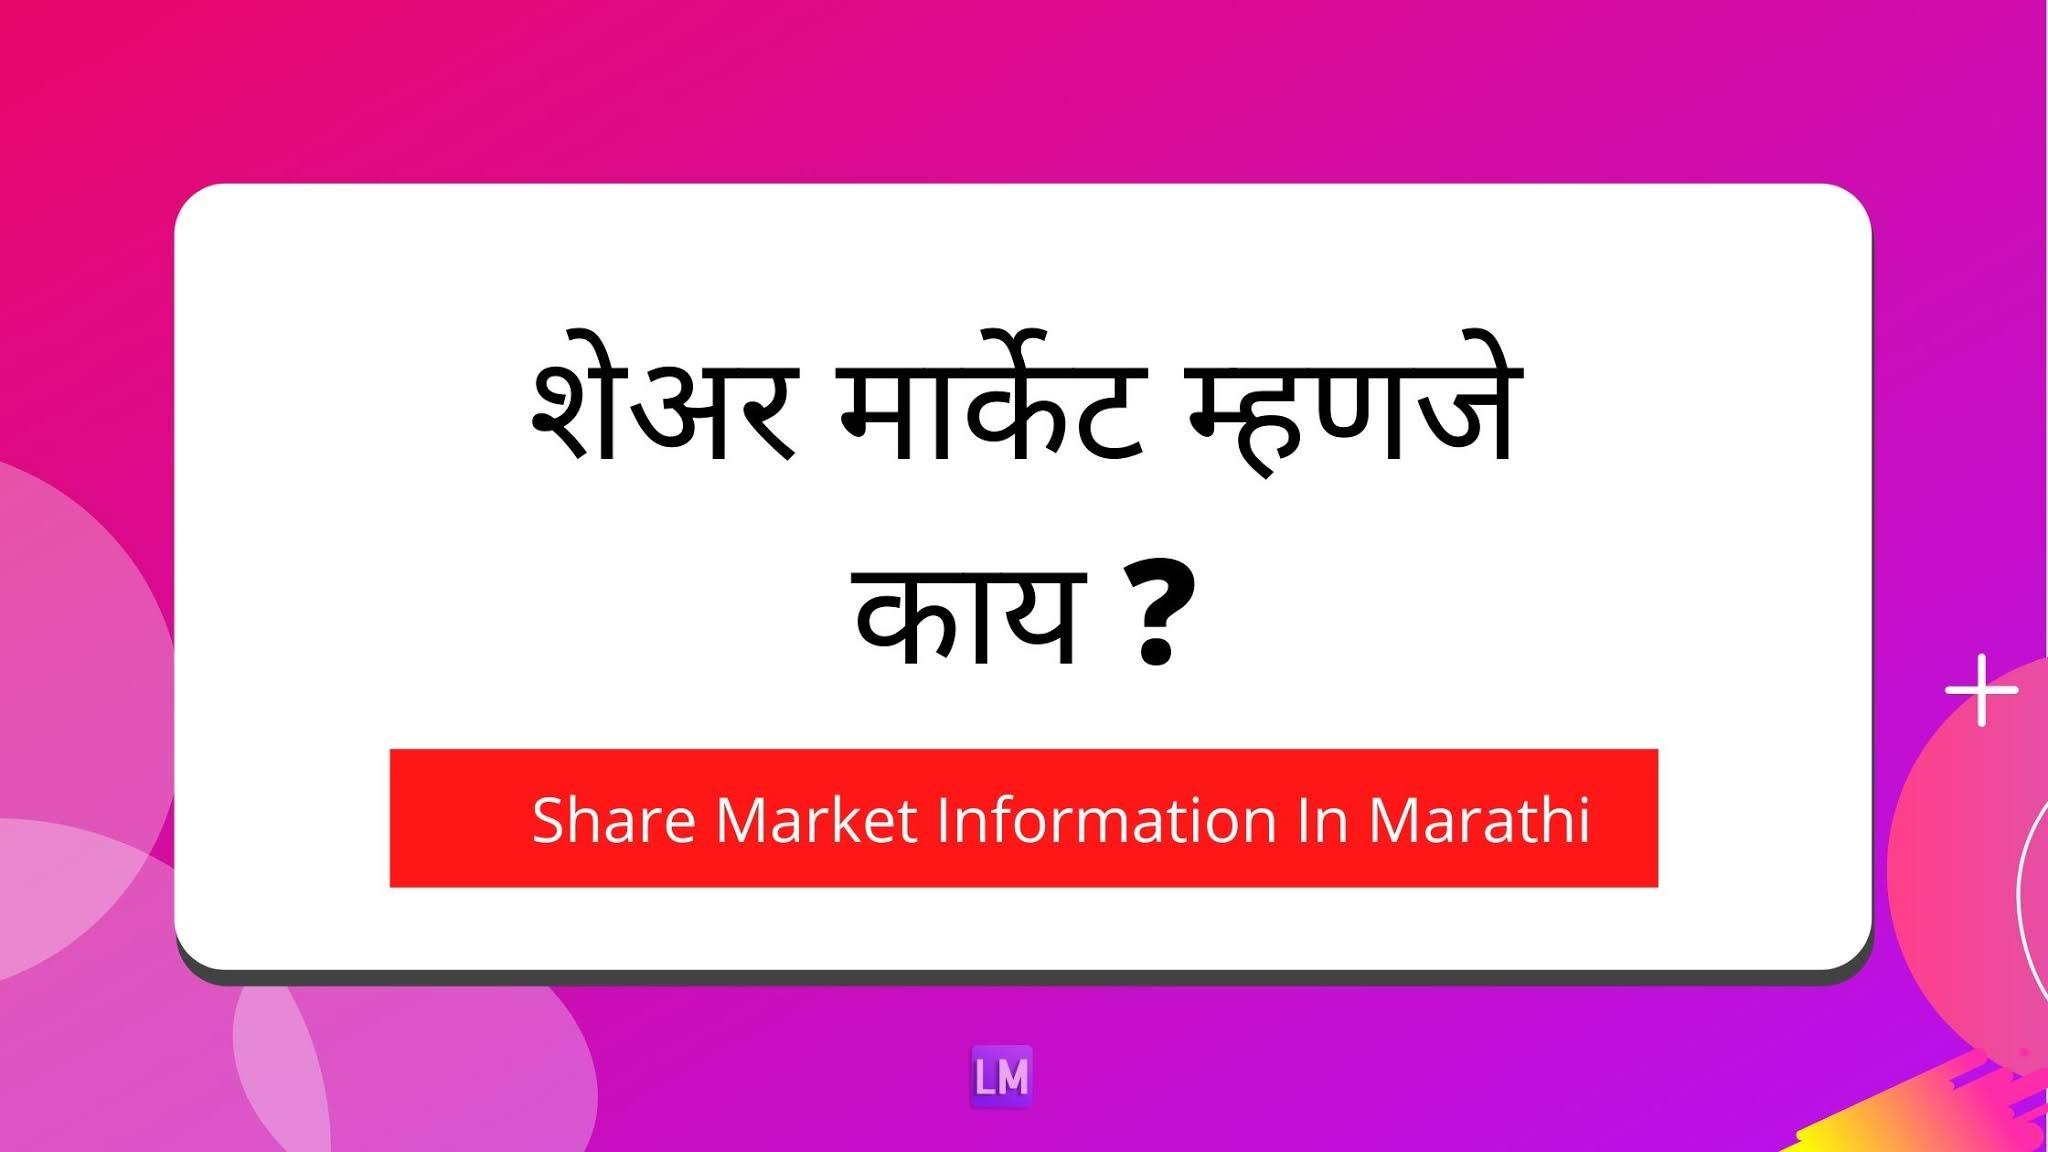 Share Market information in Marathi language, शेअर मार्केट म्हणजे काय?, What is share market, how to invest in share market information in Marathi, शेअर बाजार संपूर्ण माहिती